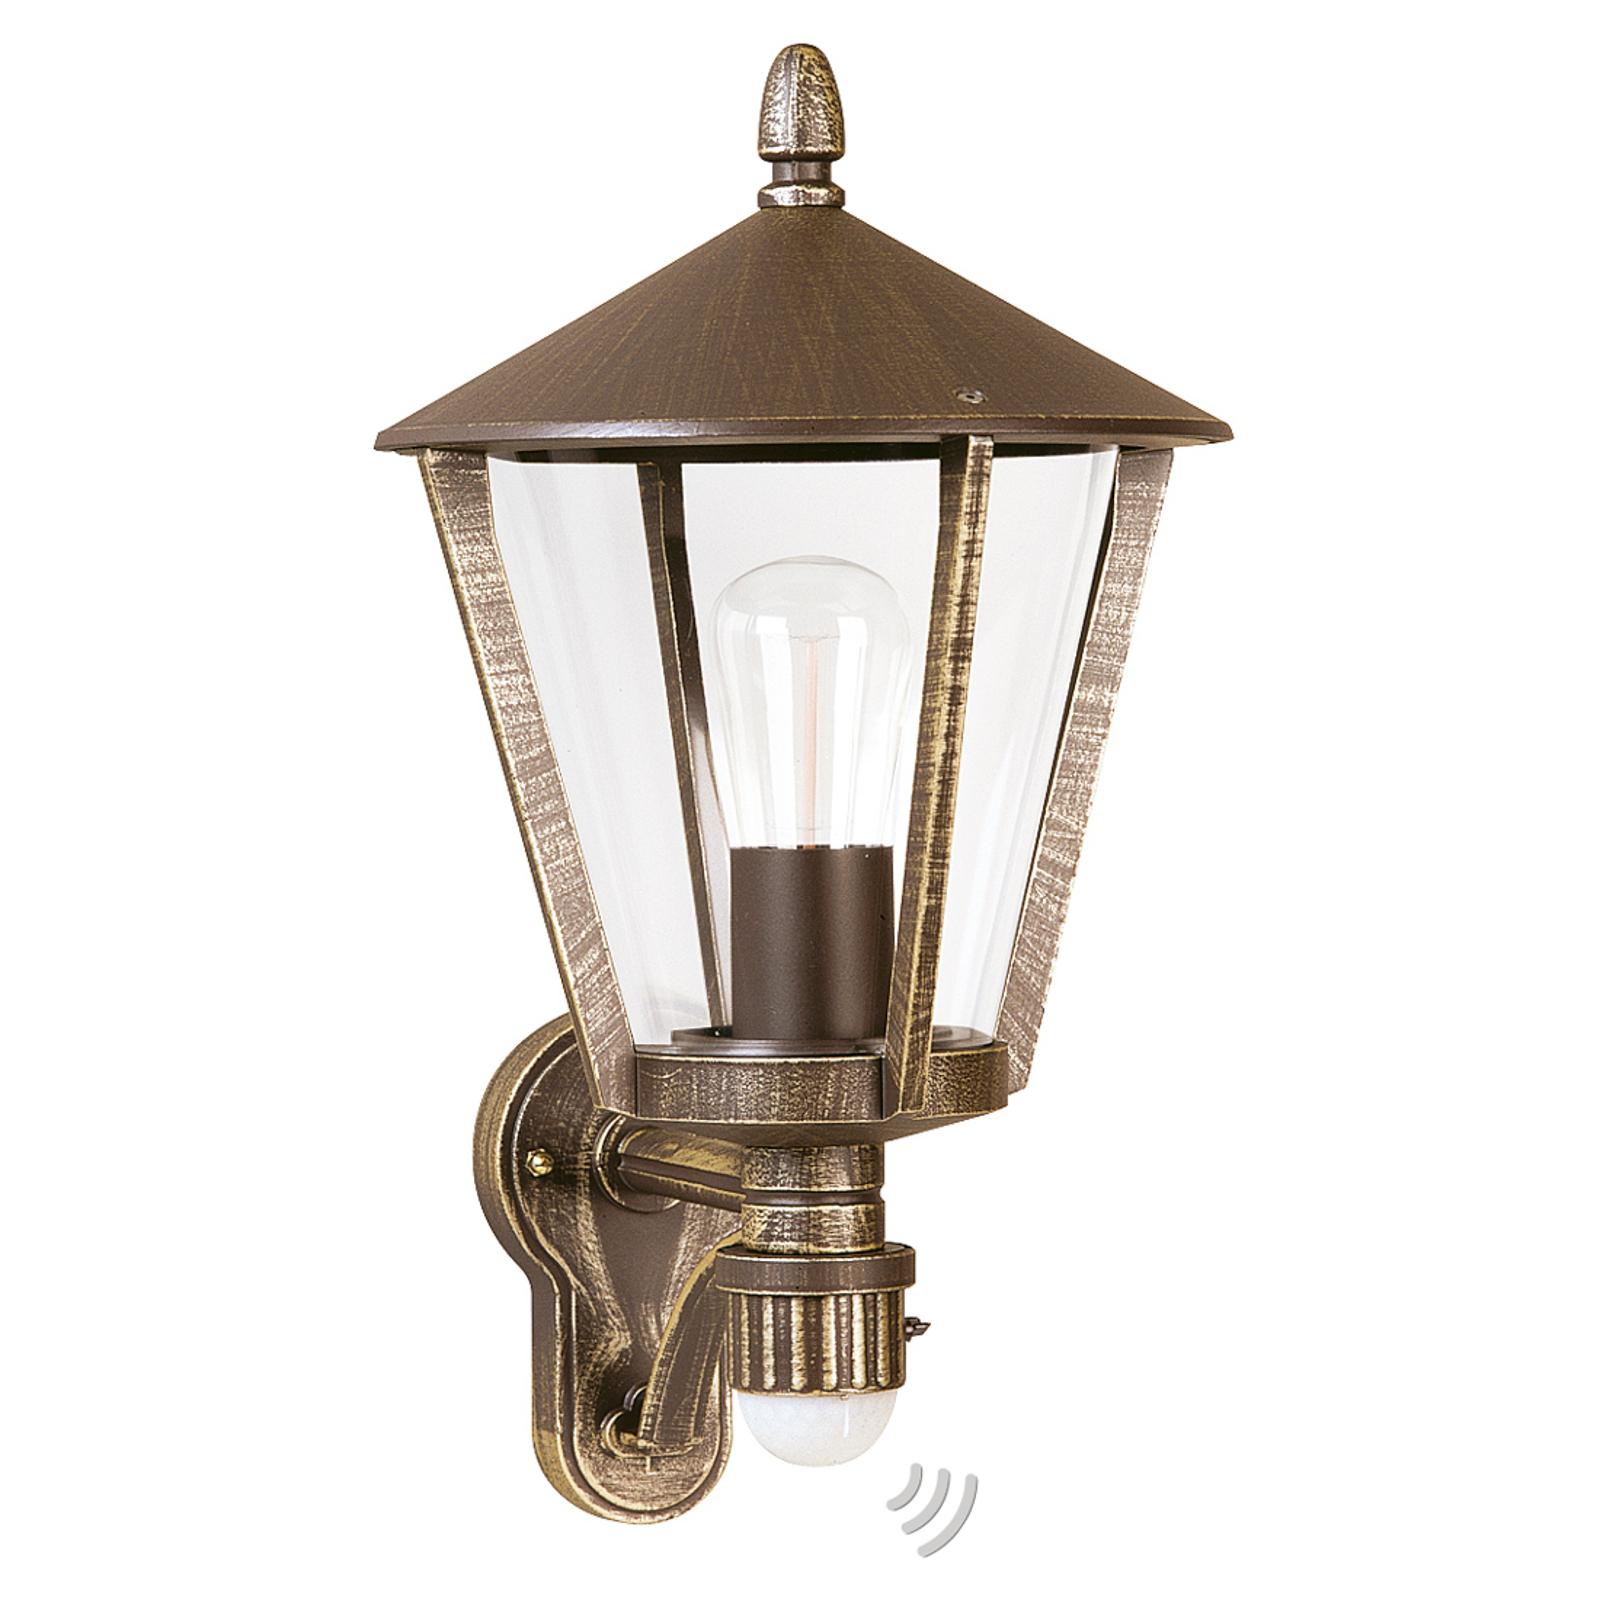 Buitenwandlamp 671 B met bewegingssensor